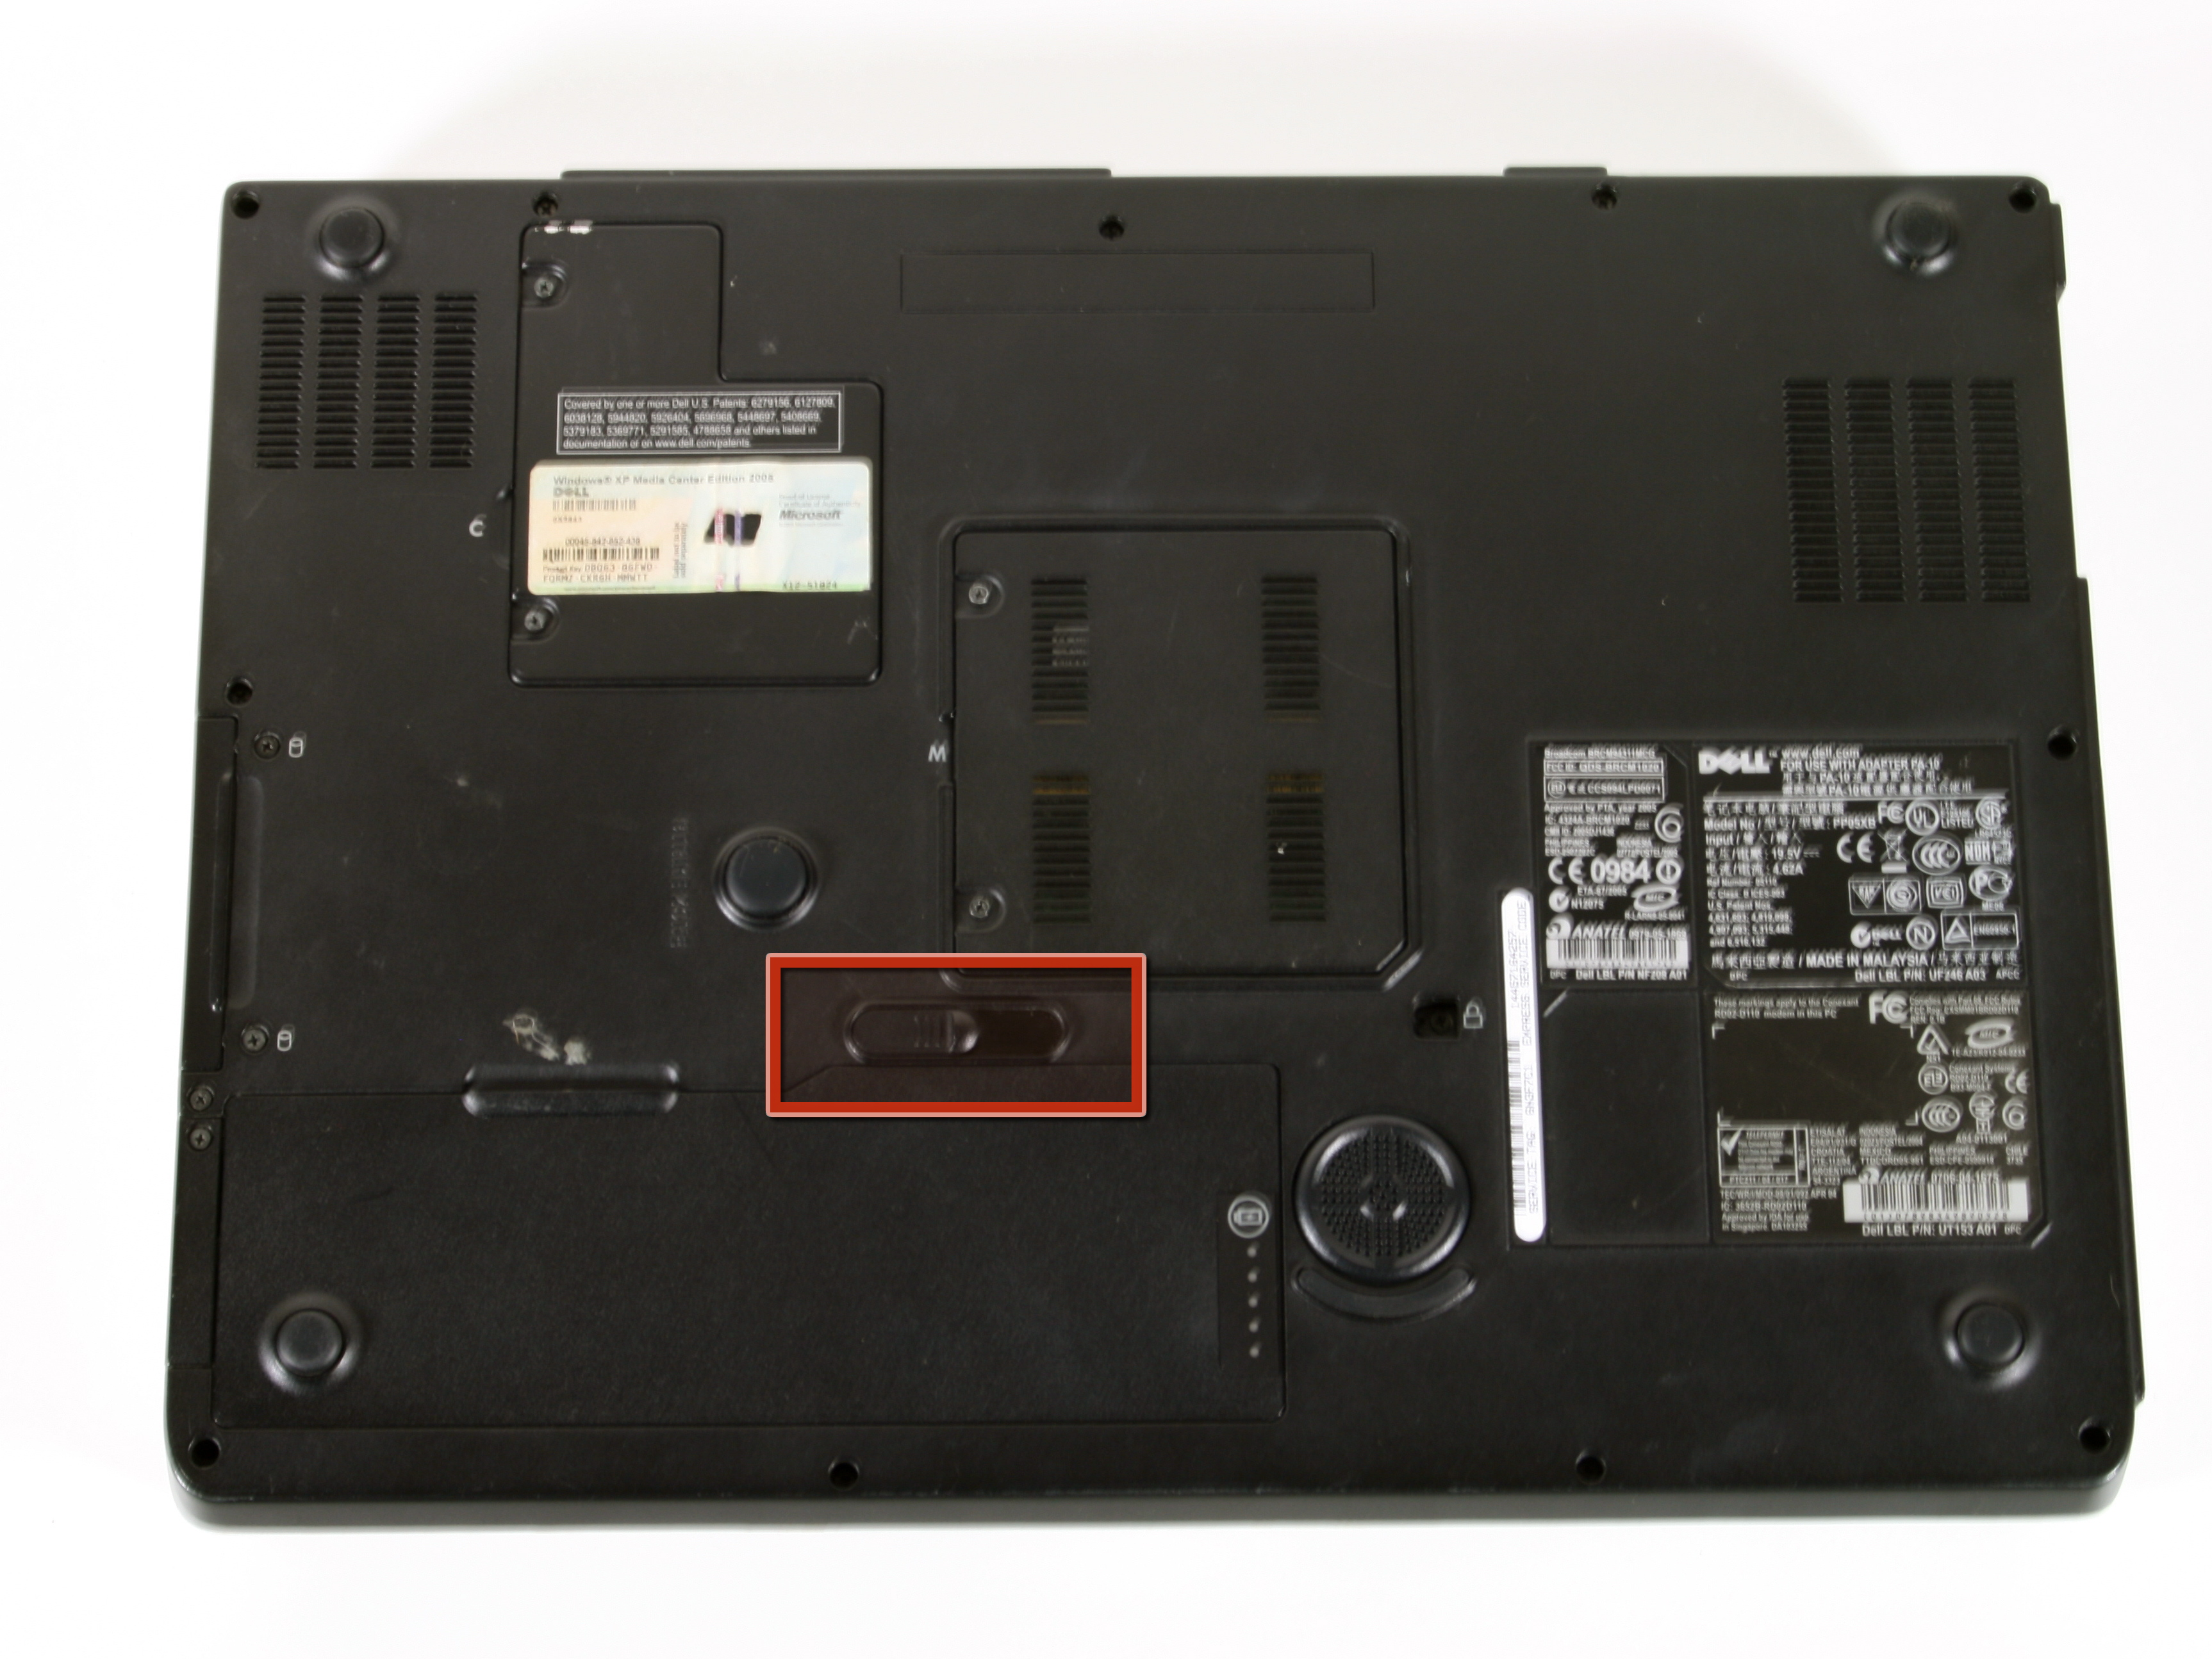 dell inspiron e1705 repair ifixit rh ifixit com Dell Inspiron 6000 Dell Inspiron E1705 Drivers